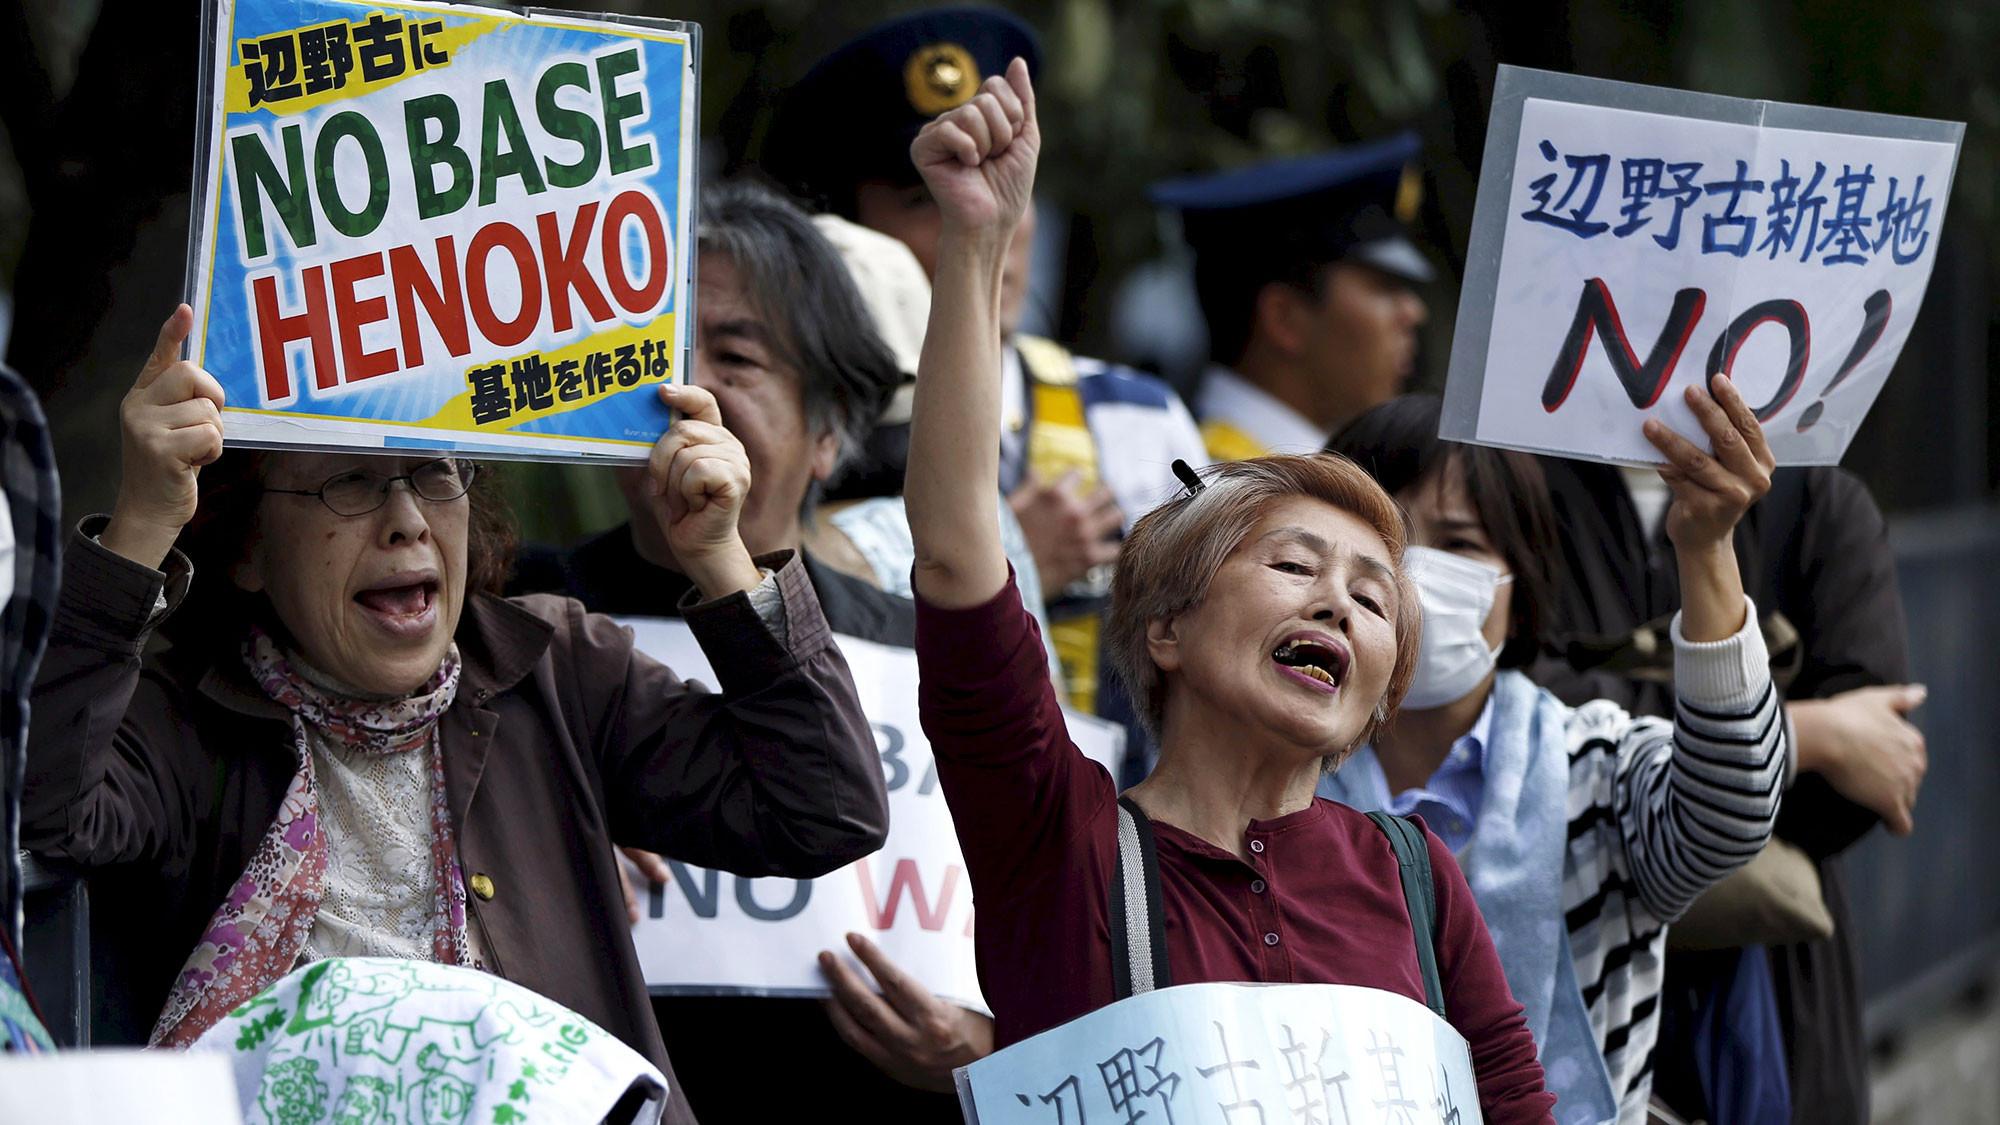 <p>Фото: &copy;&nbsp;REUTERS/Issei Kato/Files</p>